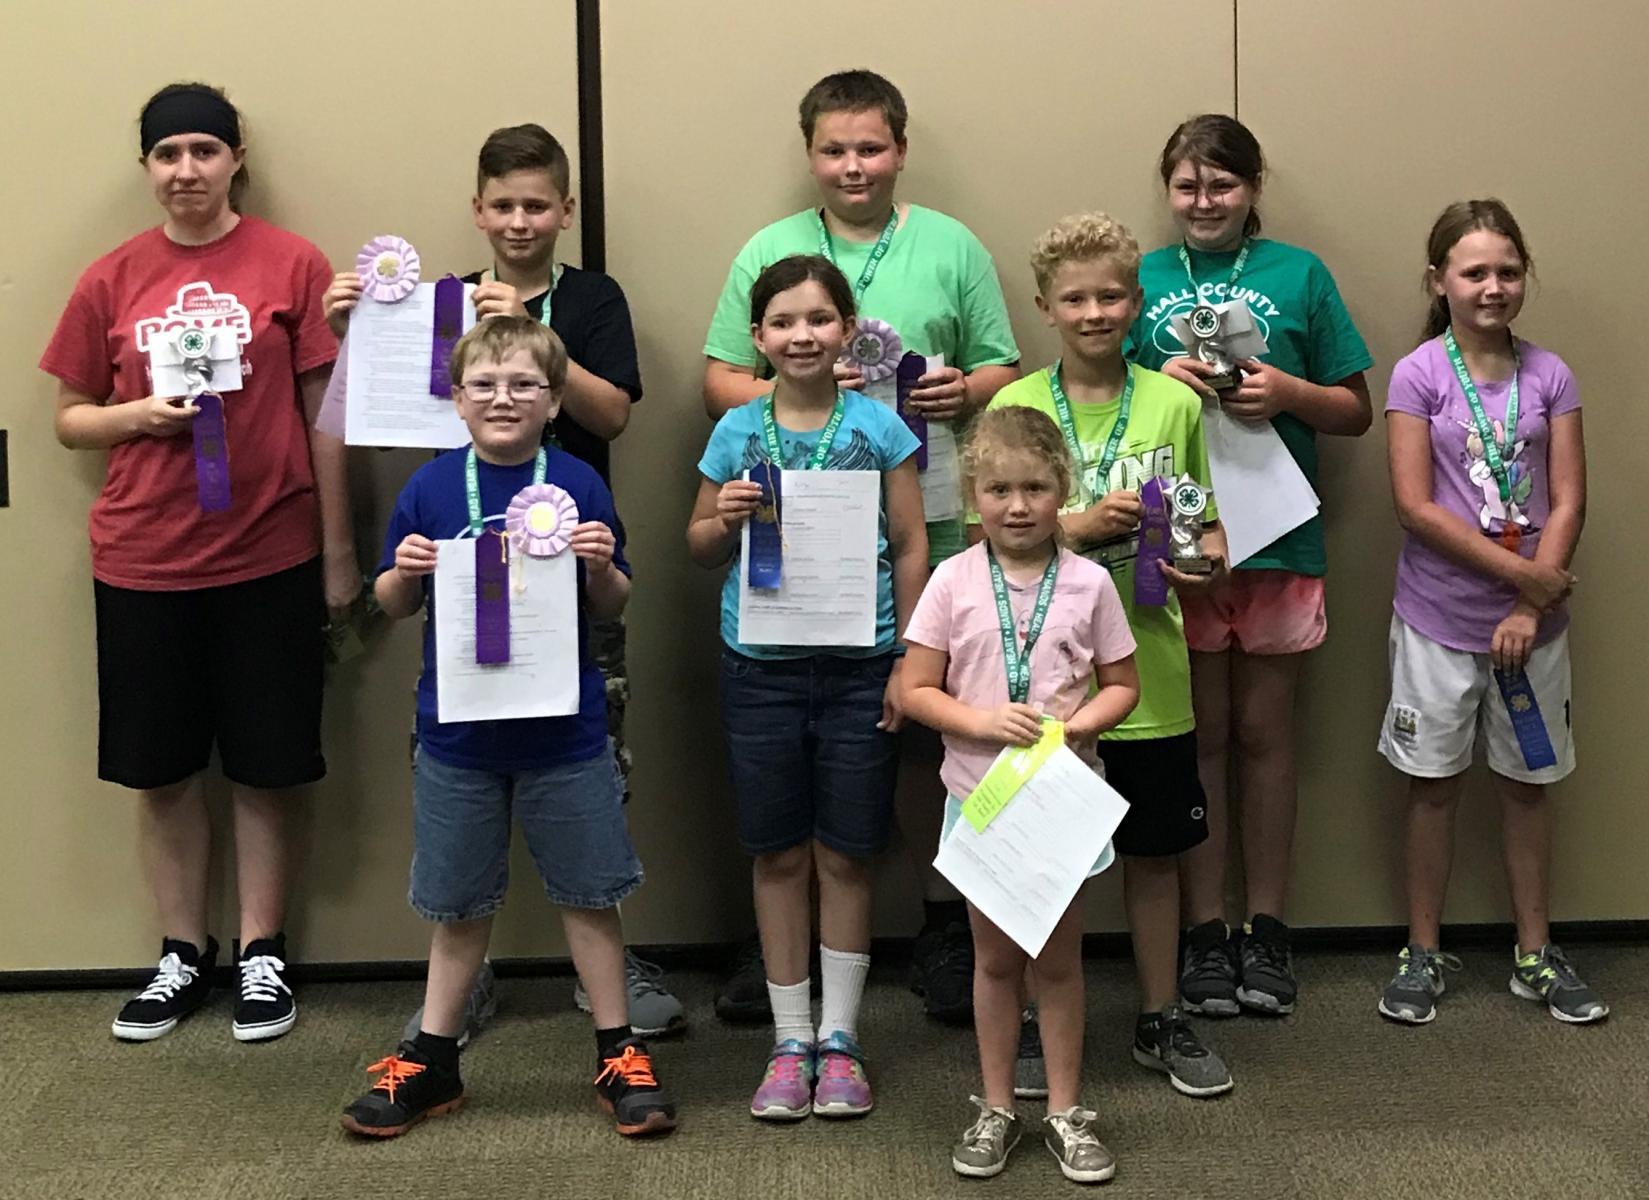 Kids holding ribbons